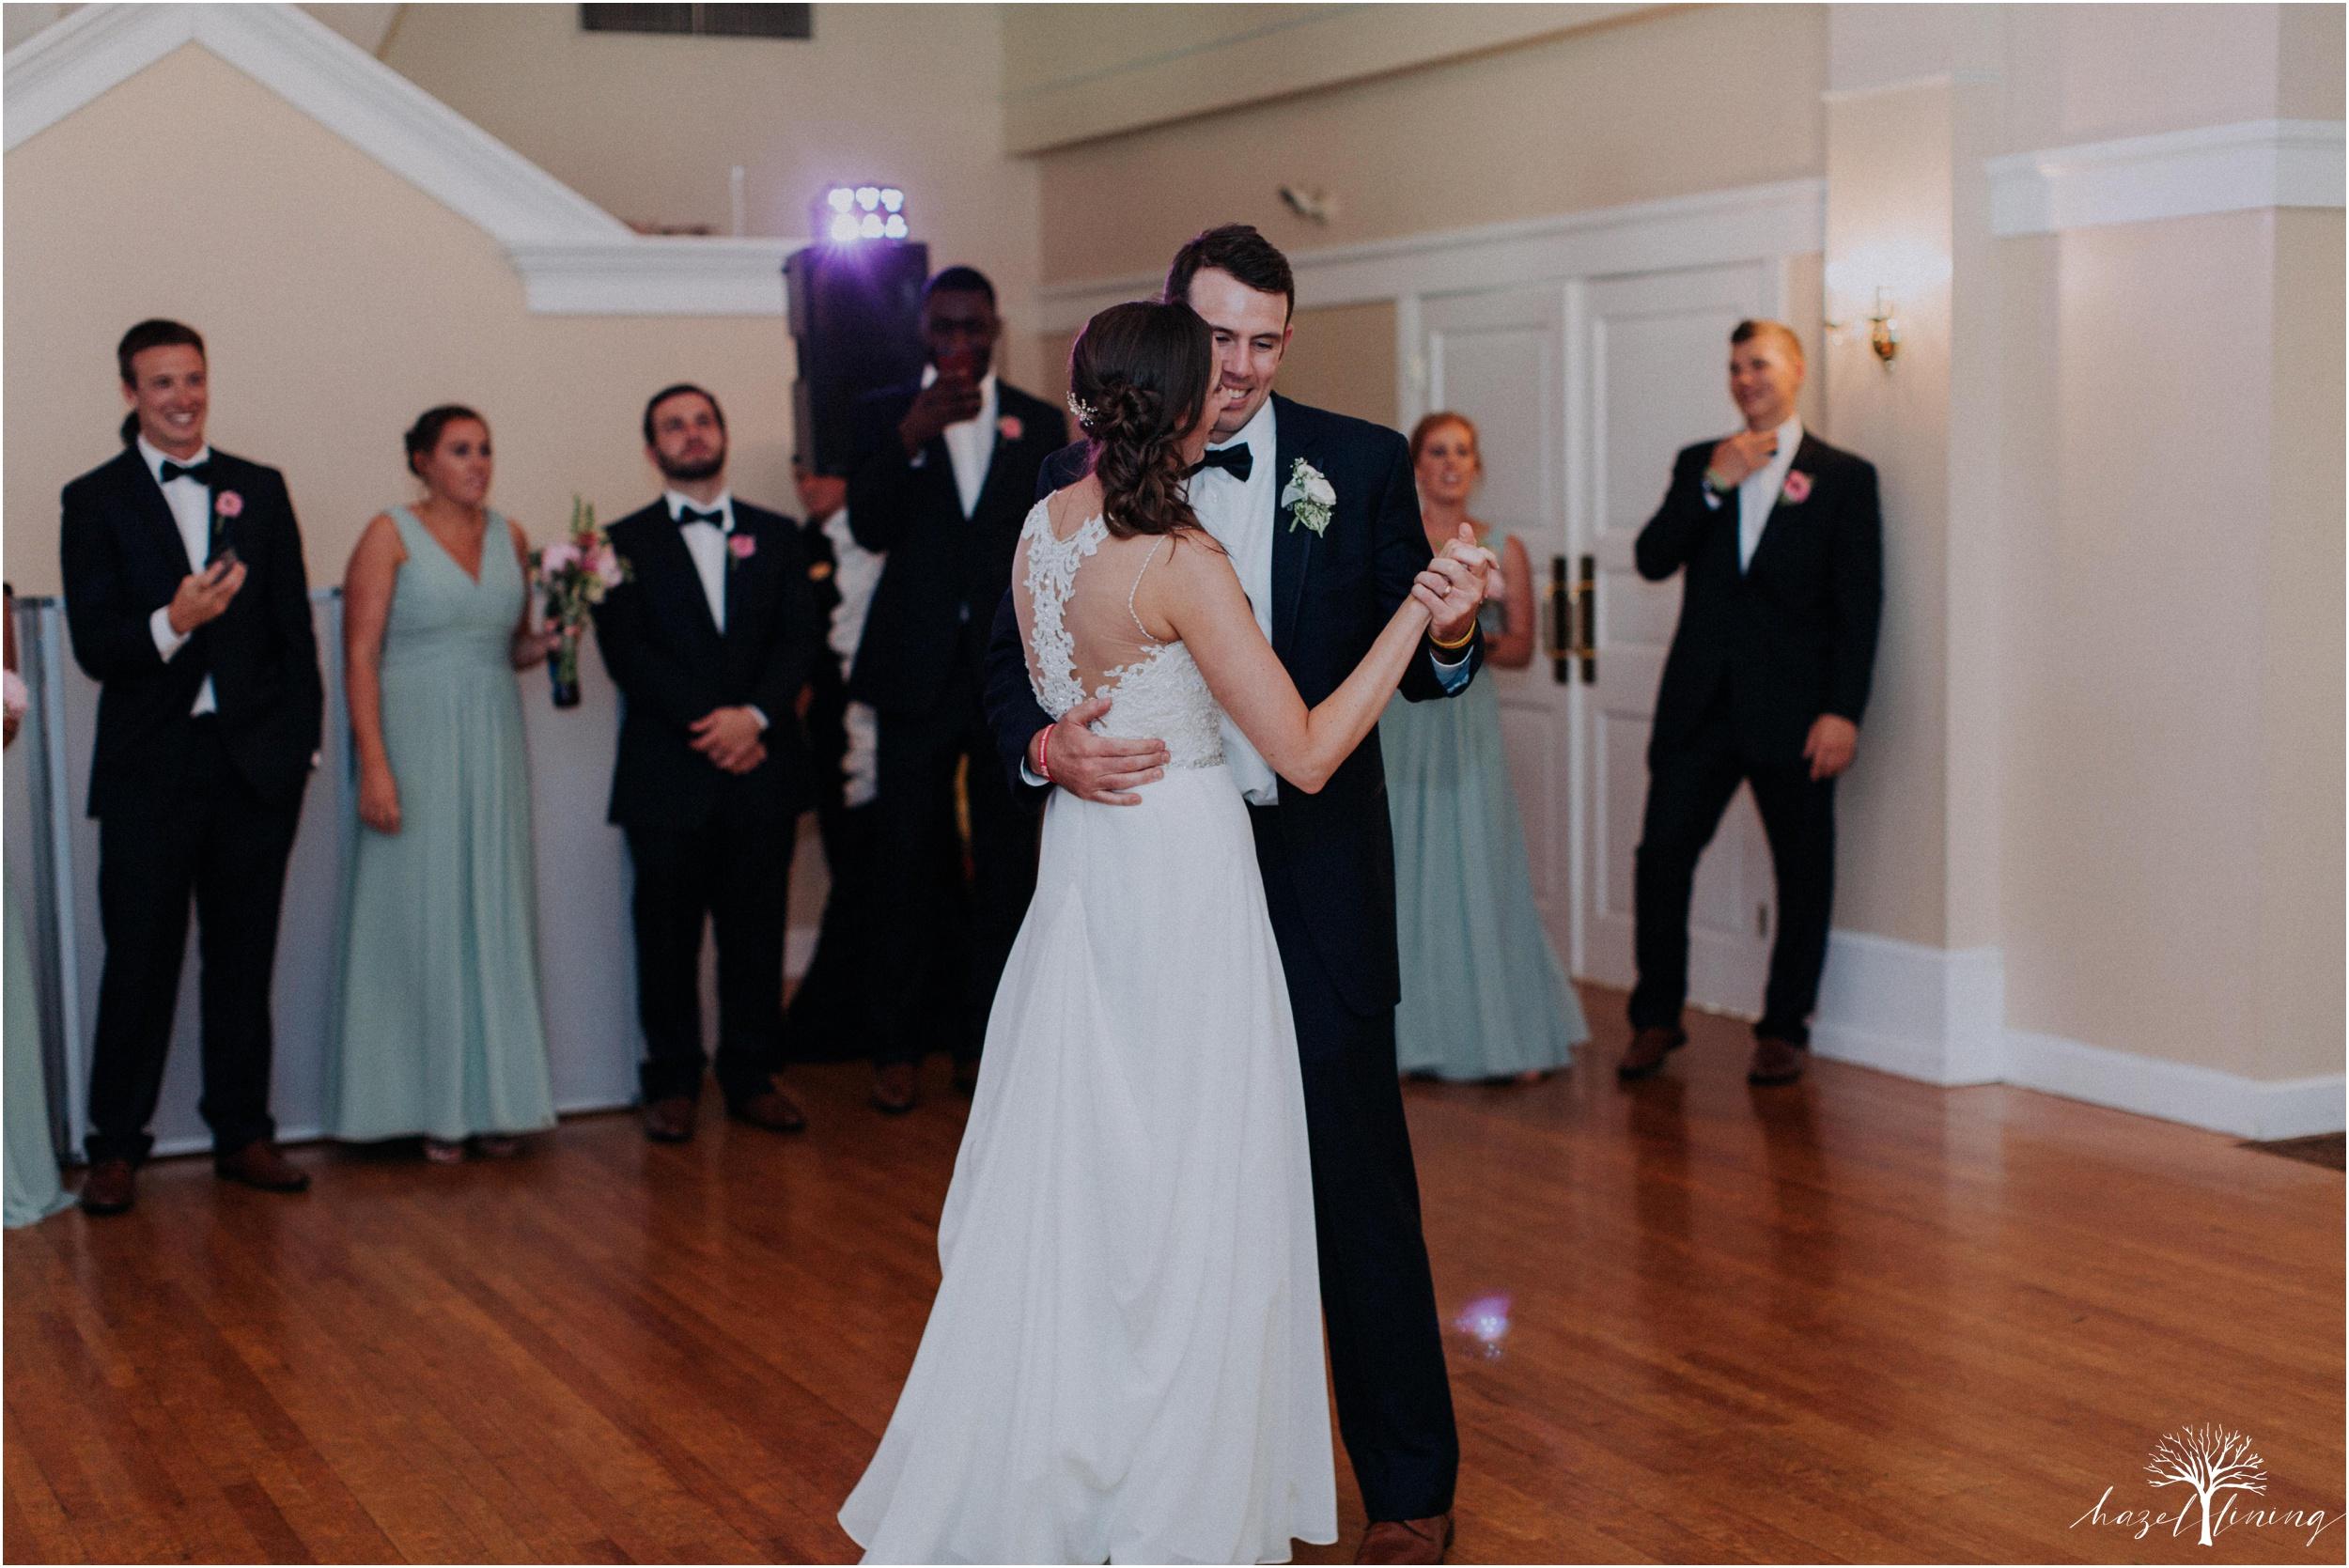 hazel-lining-travel-wedding-elopement-photography_0132.jpg